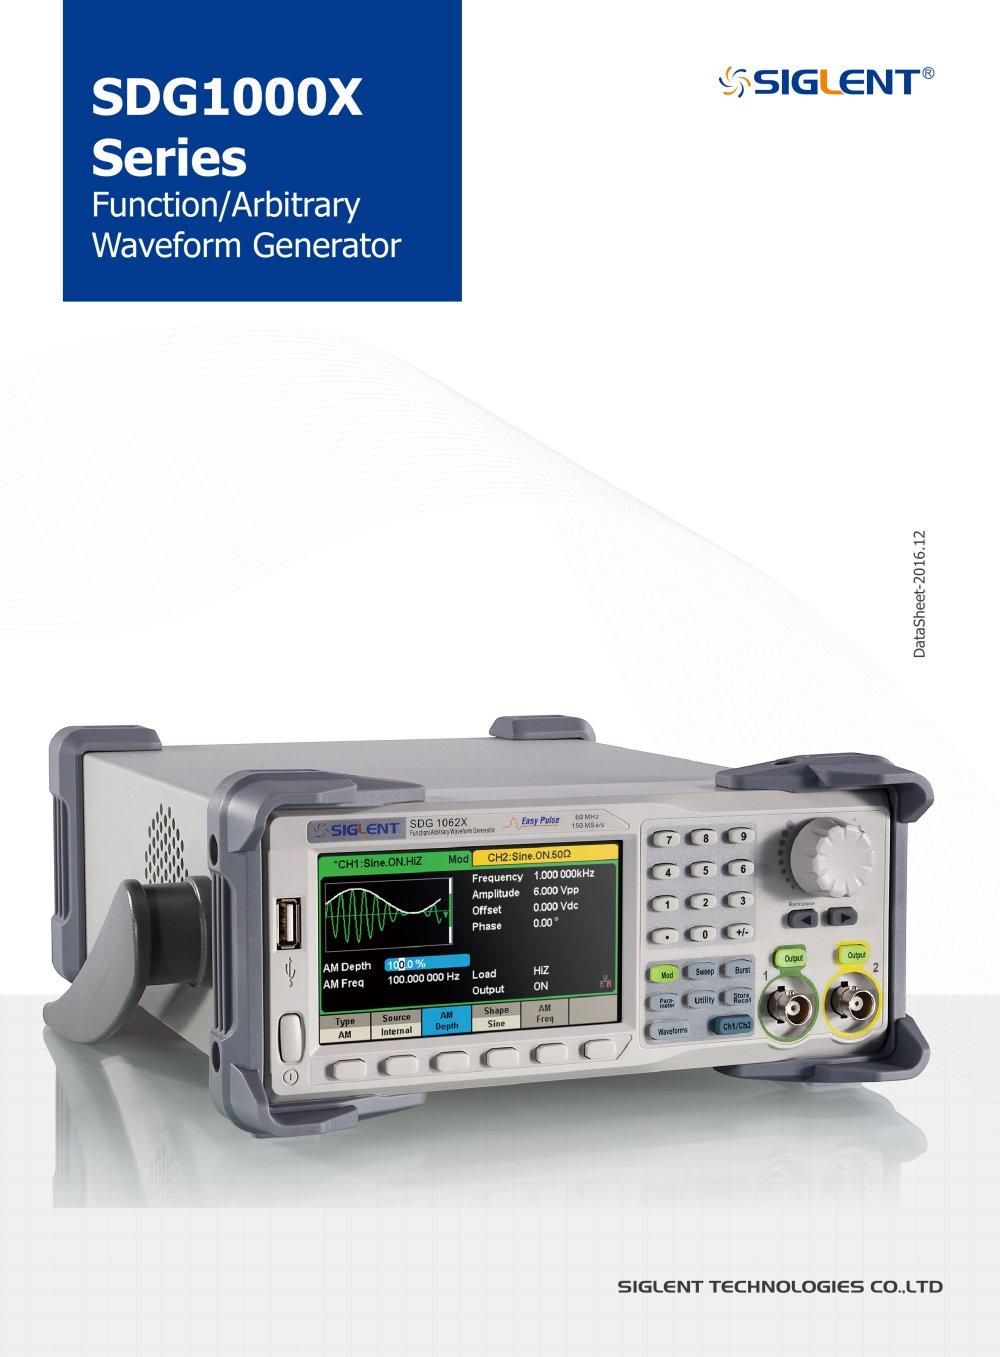 Siglent Sdg1000x Waveform Generators Datasheet Function 1 12 Pages